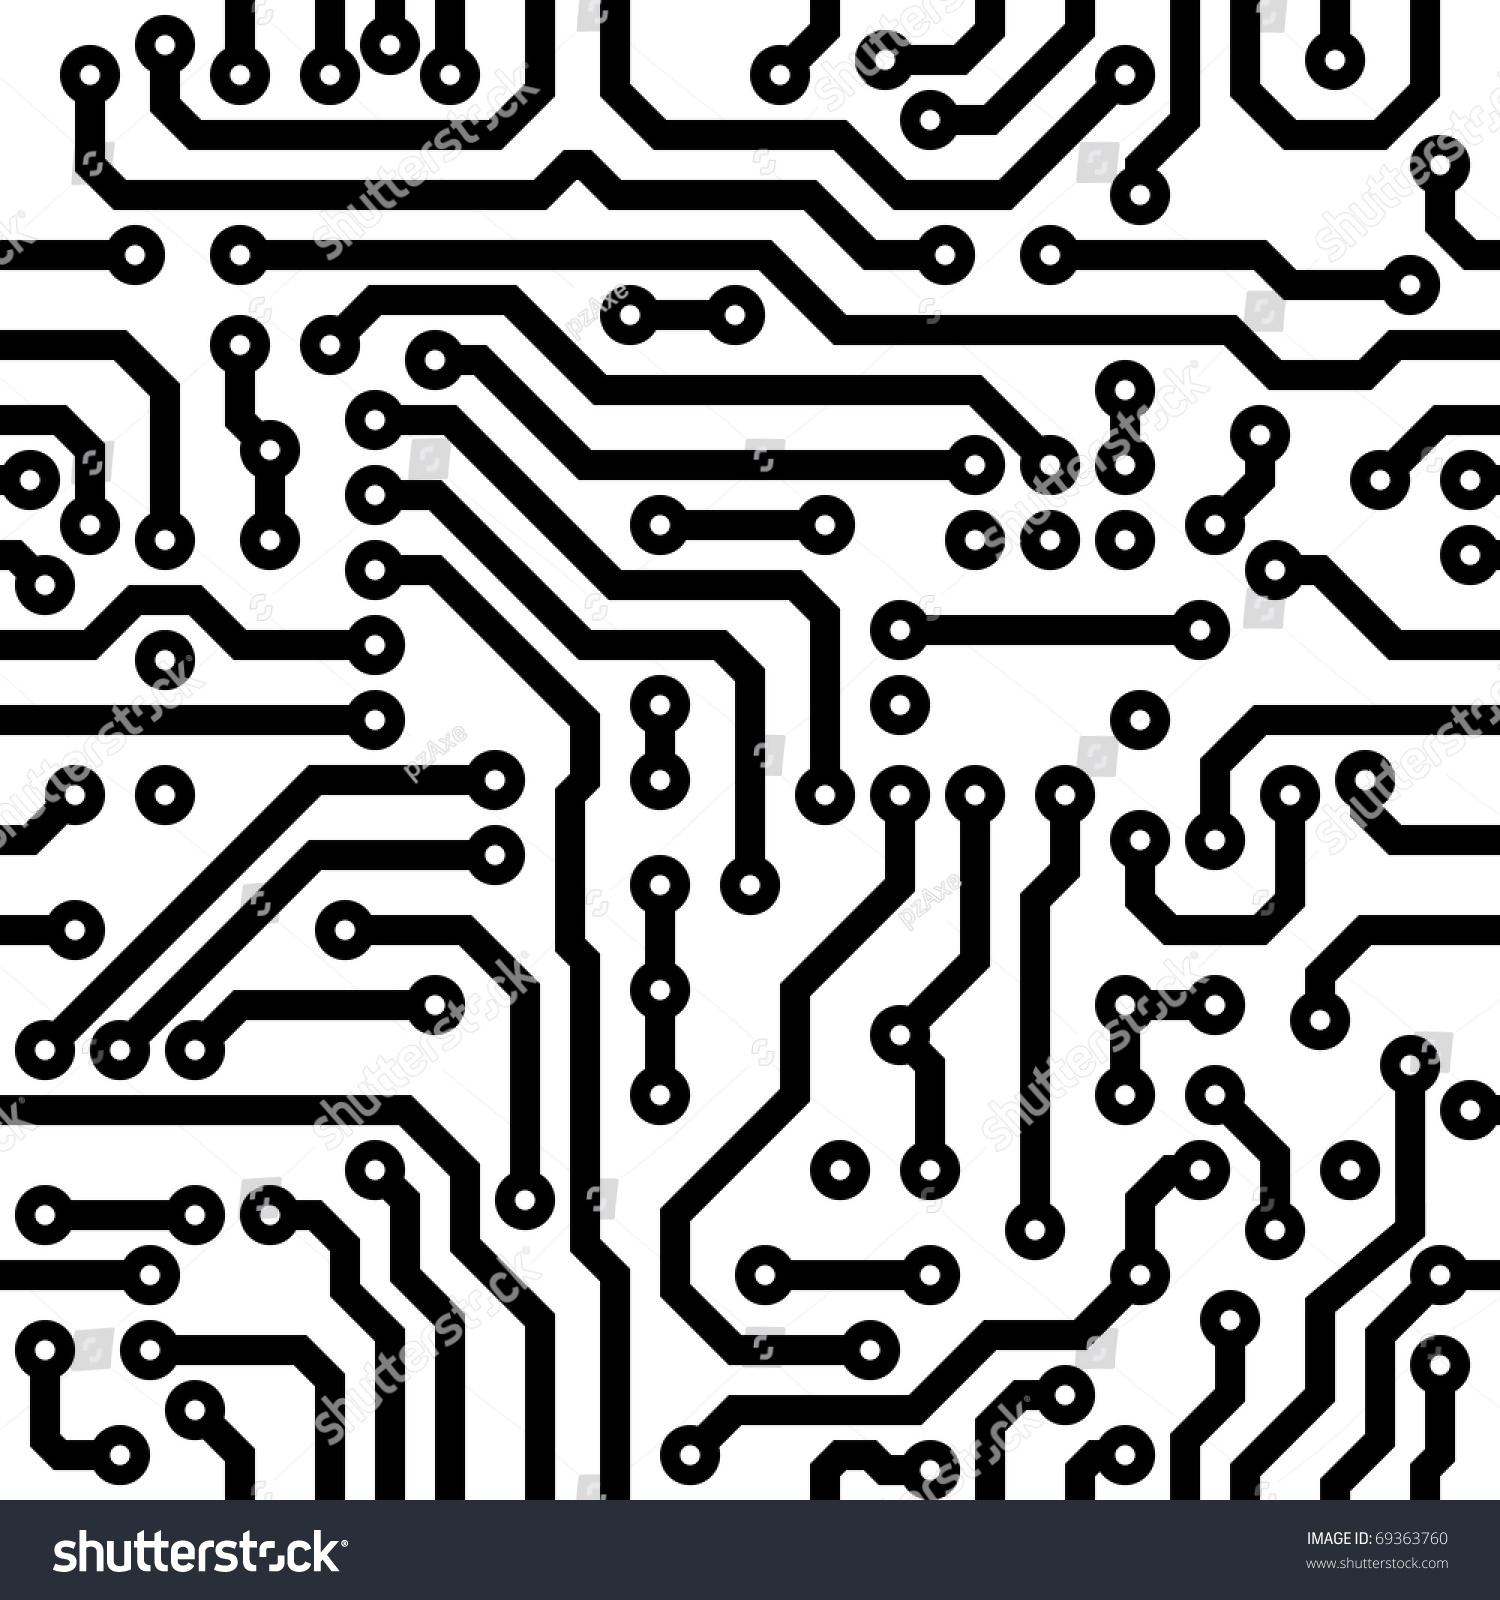 Circuit Board Vector Texture Computer Nanotechnology Image ...